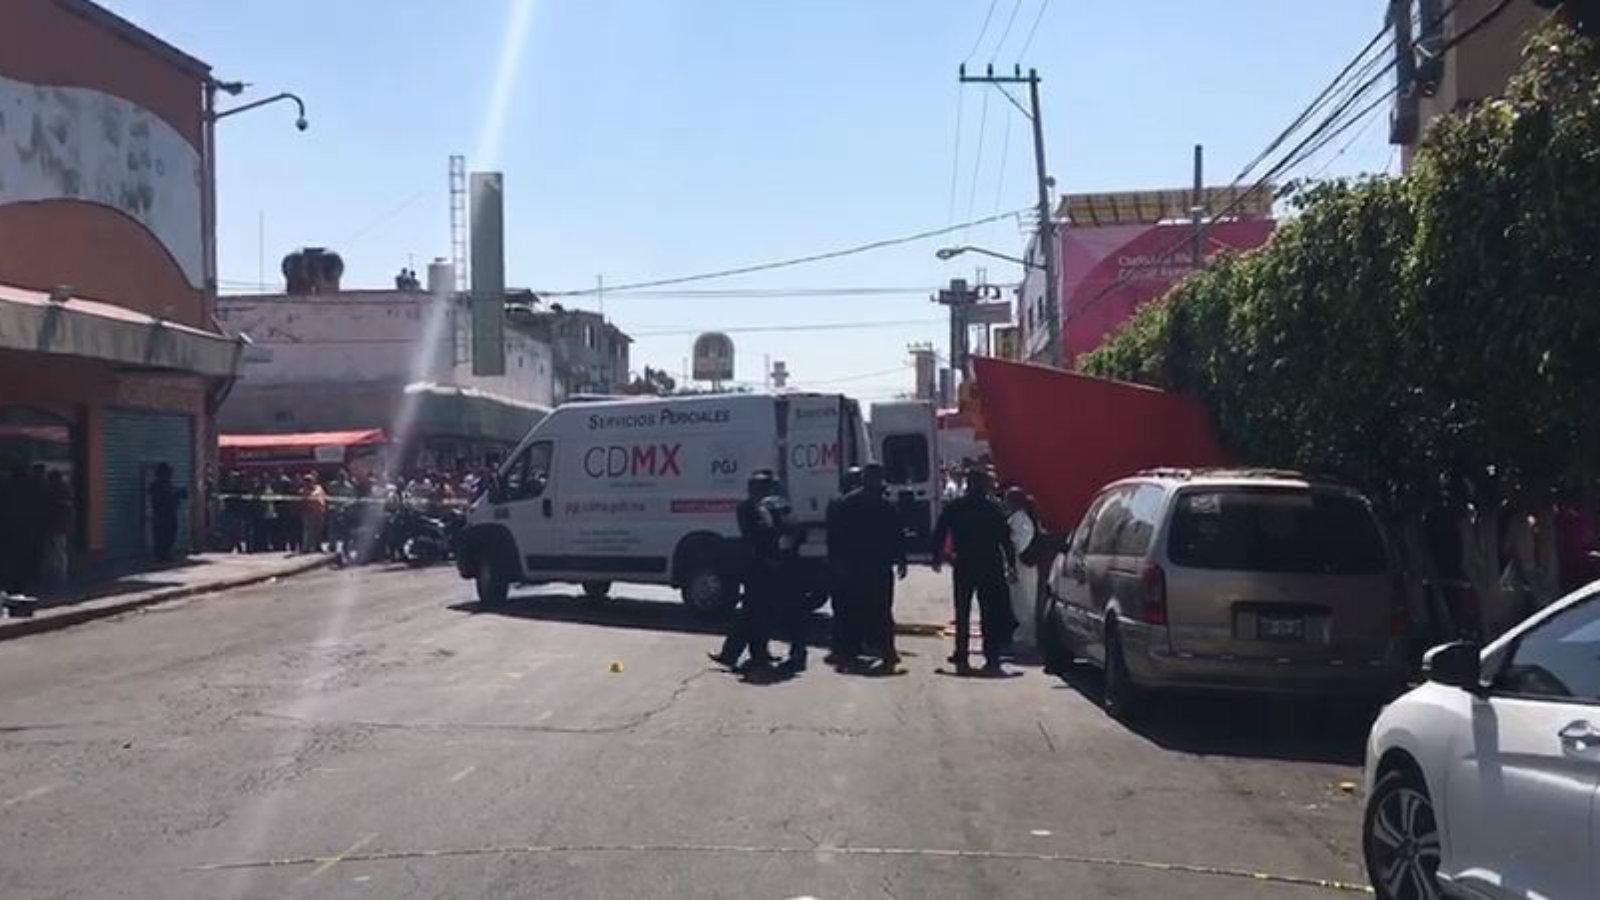 asesinados gustavo a madero cdmx violencia mexico